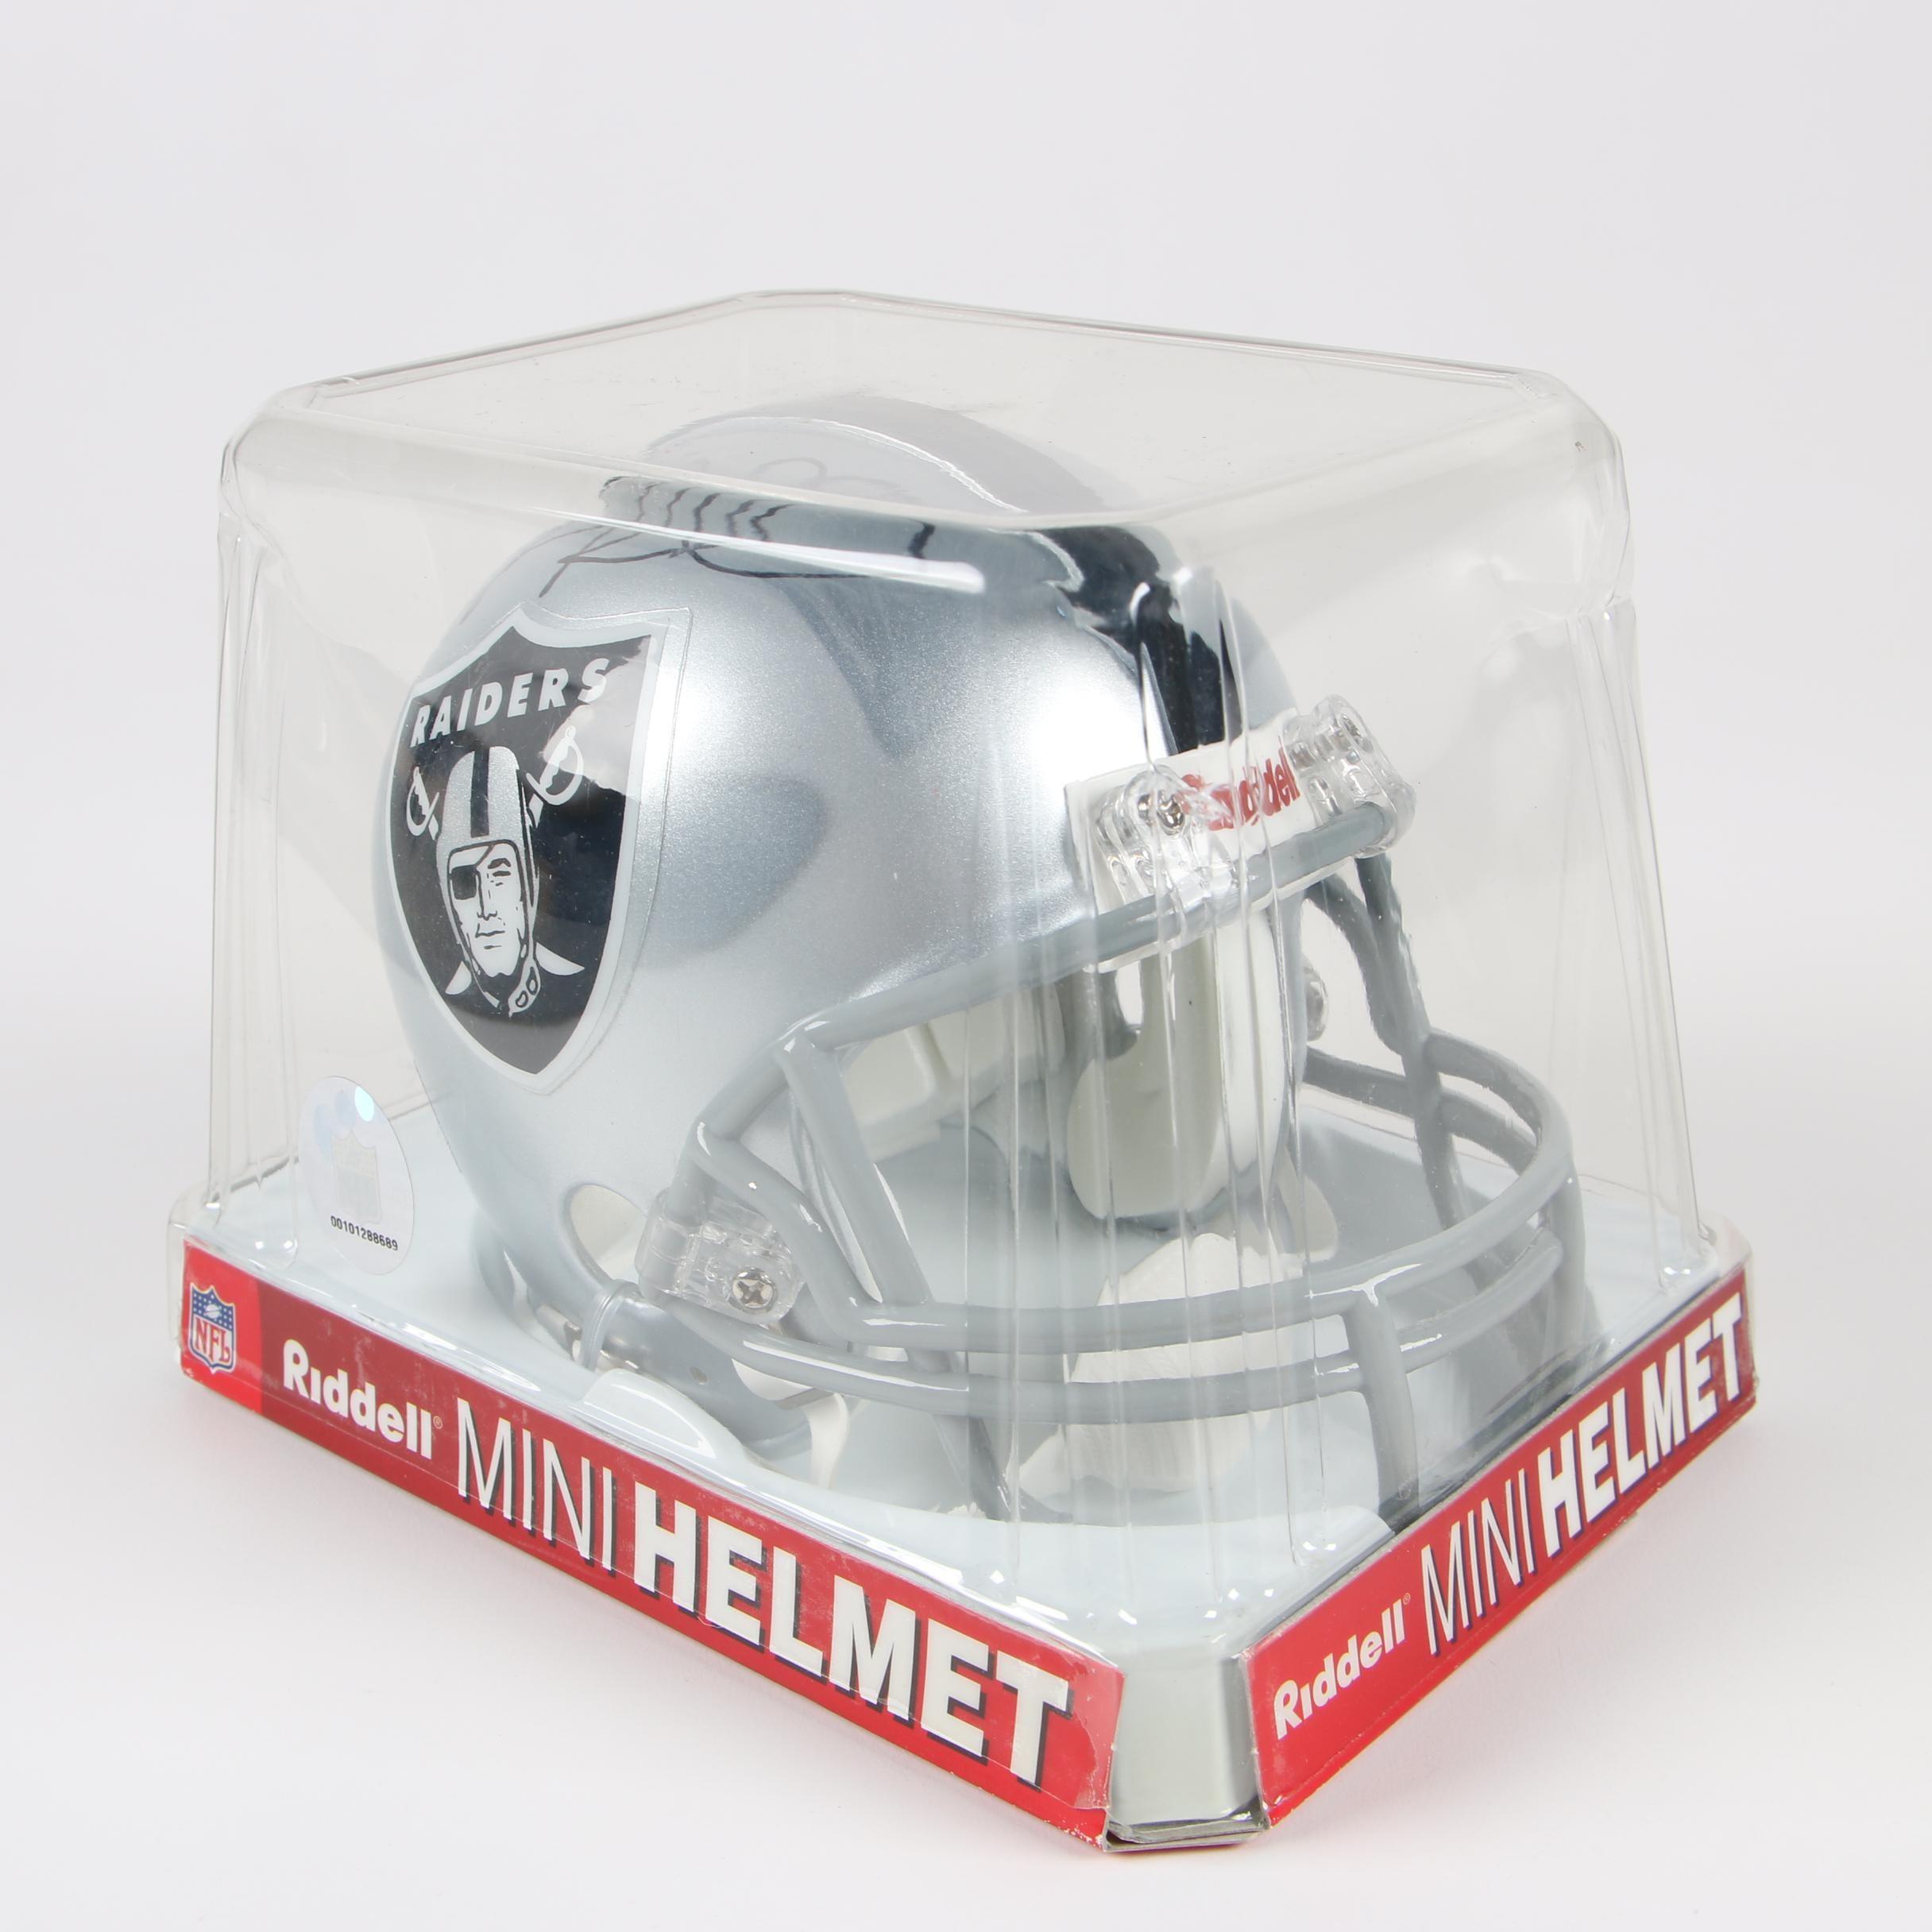 Oakland Raiders Signed Mini Helmet by Riddell